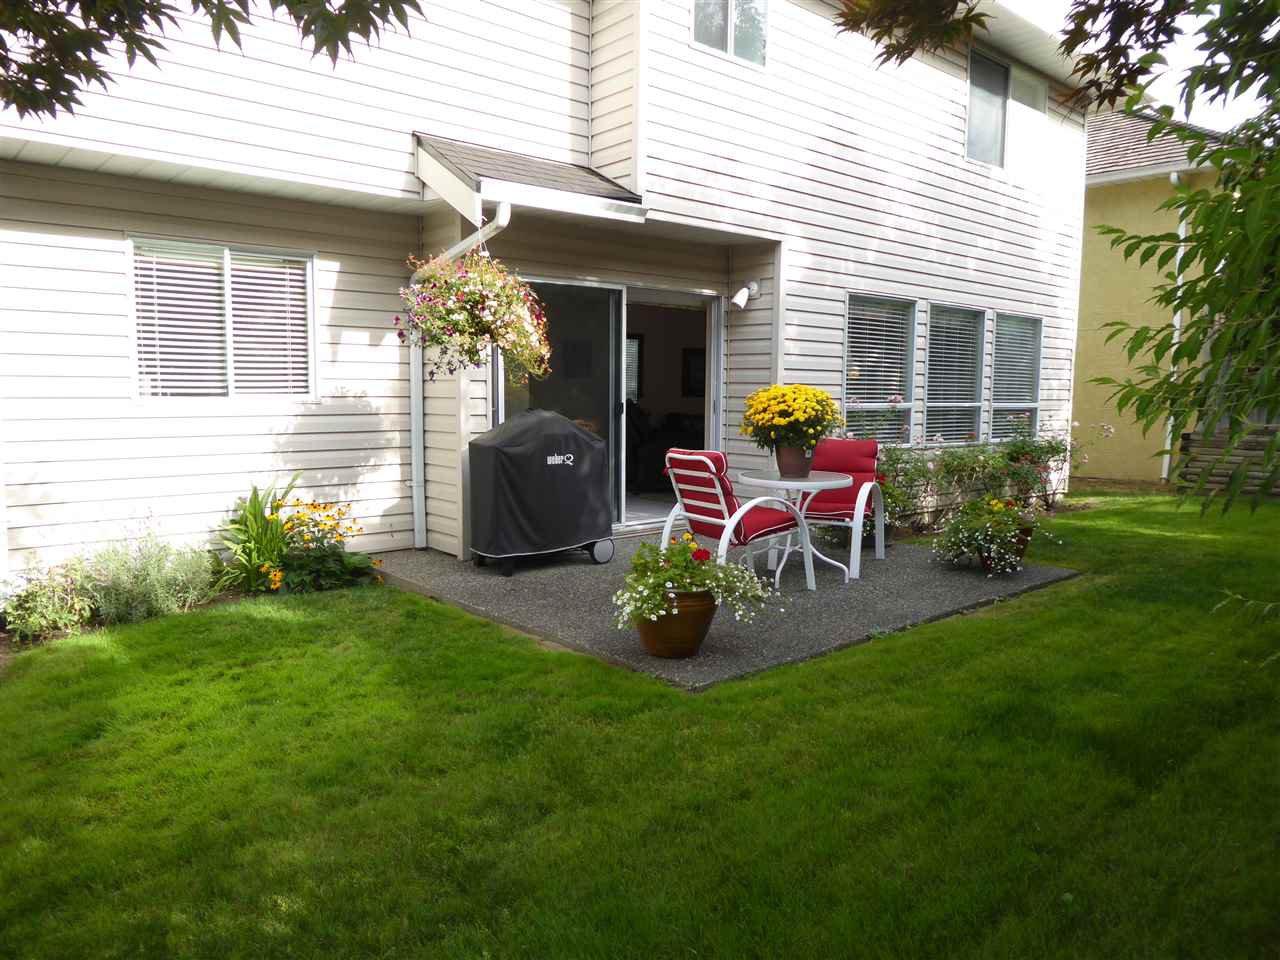 Photo 10: Photos: 1252 DEWAR Way in Port Coquitlam: Citadel PQ House for sale : MLS®# R2199639